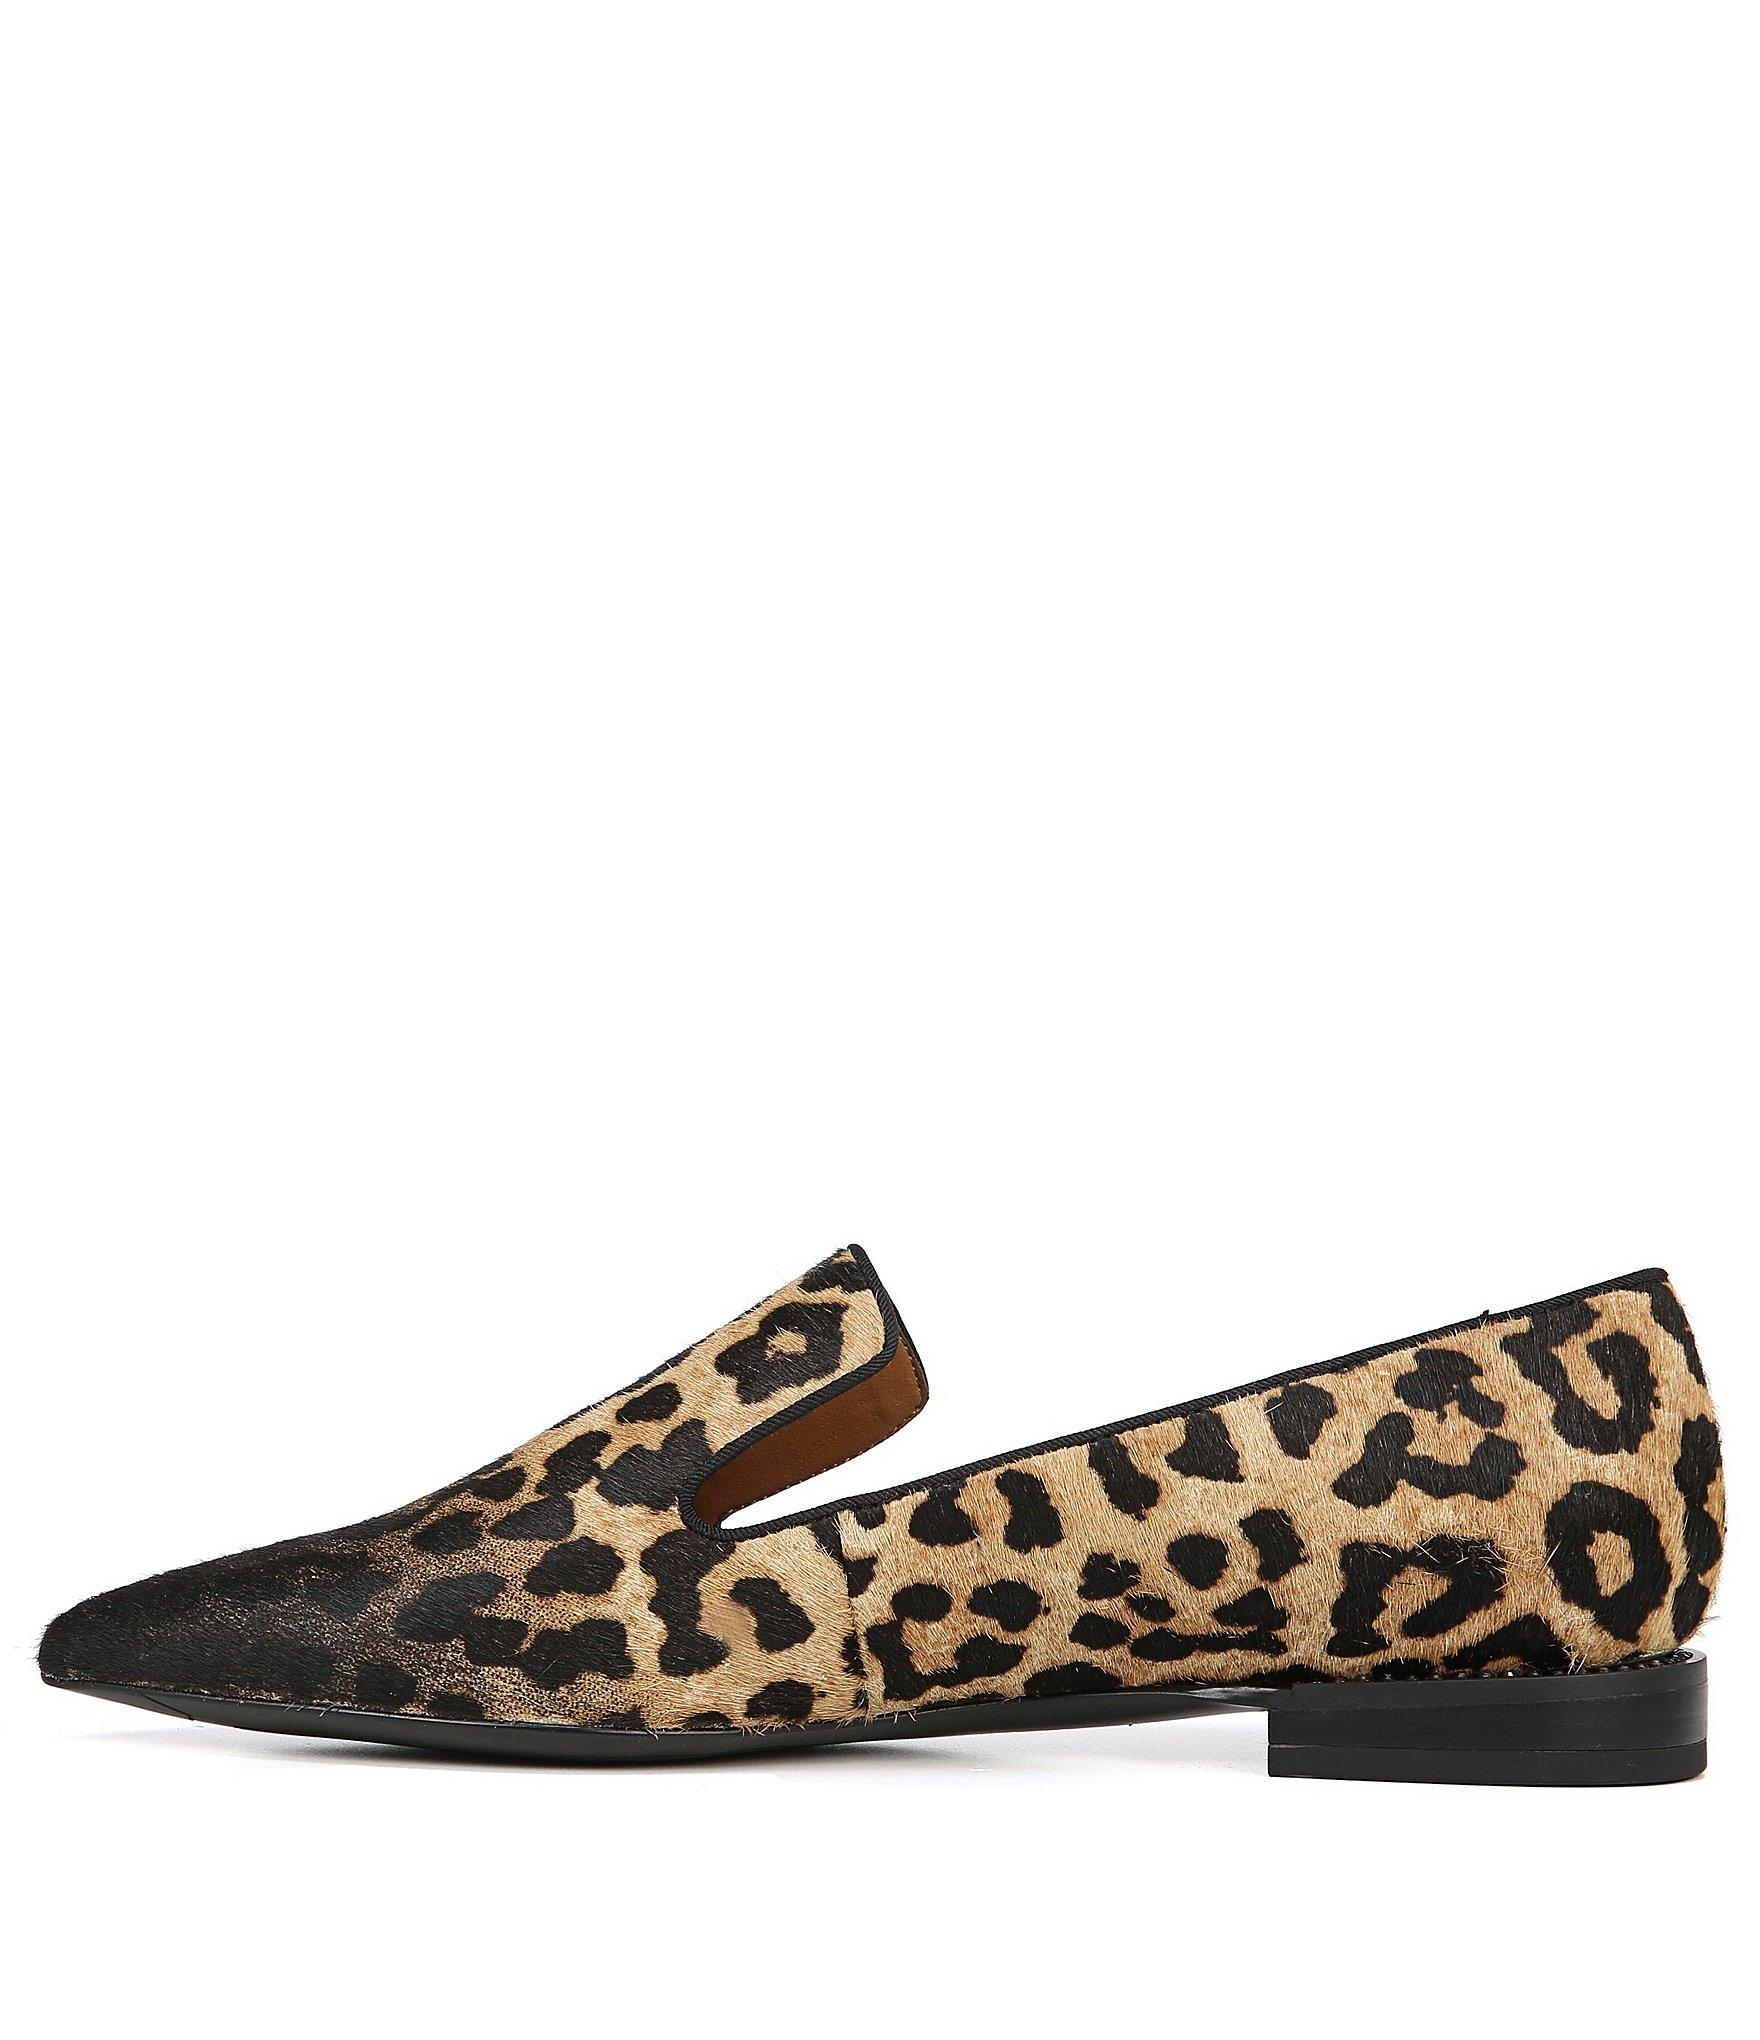 633d675dc61 Franco Sarto - Multicolor Sarto By Topaz 2 Leopard Print Calf Hair Loafers  - Lyst. View fullscreen